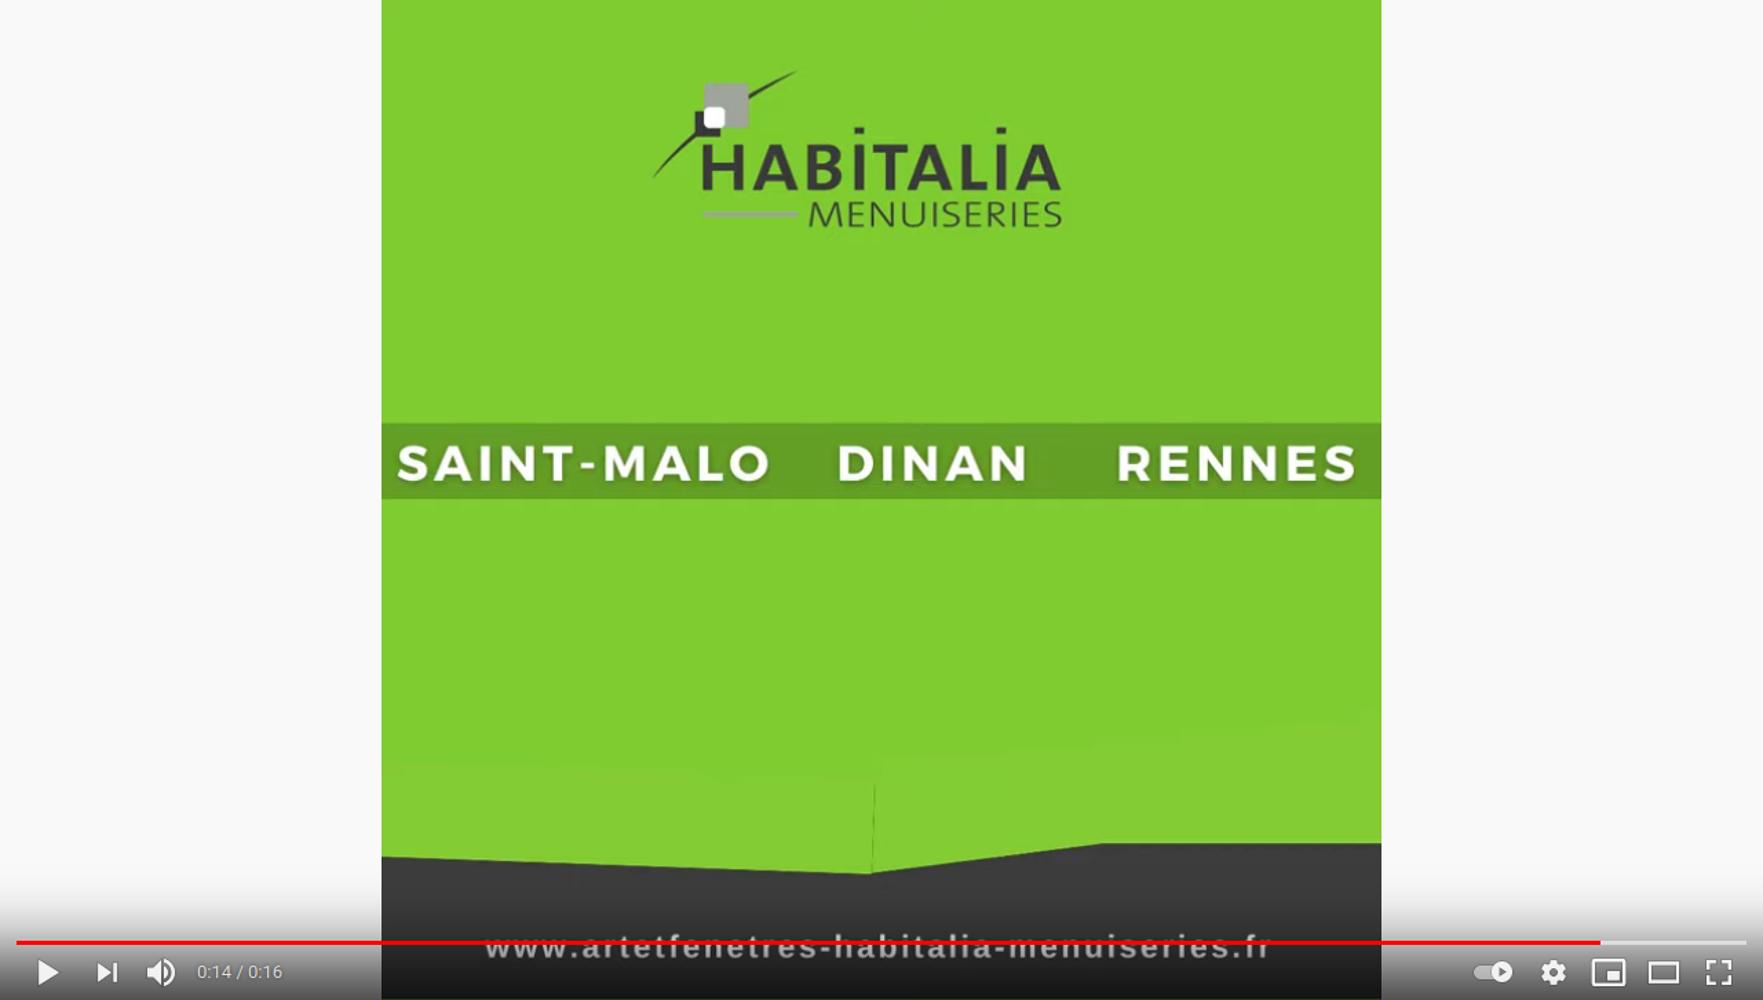 Store-banne - pergola - Saint-Brieuc - Dinan - Rennes 0